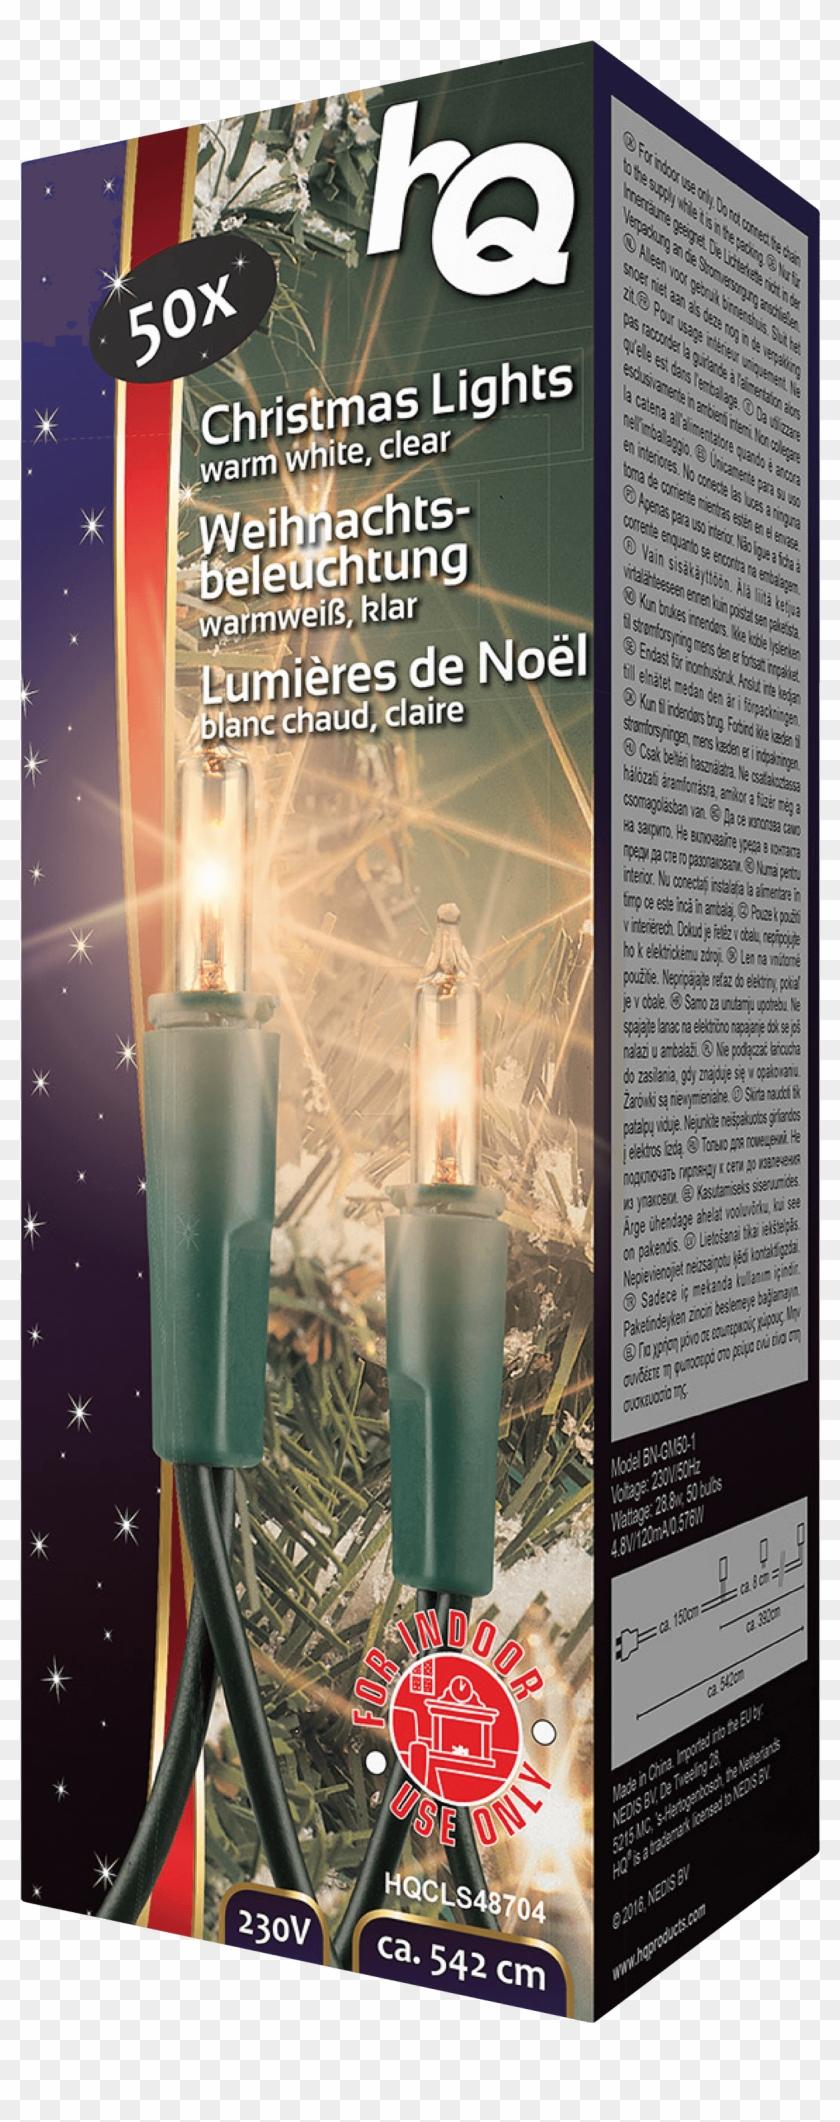 Christmas Light 50 Incandescent Hq Hqcls48704 - Incandescent Light Bulb Clipart #3183098